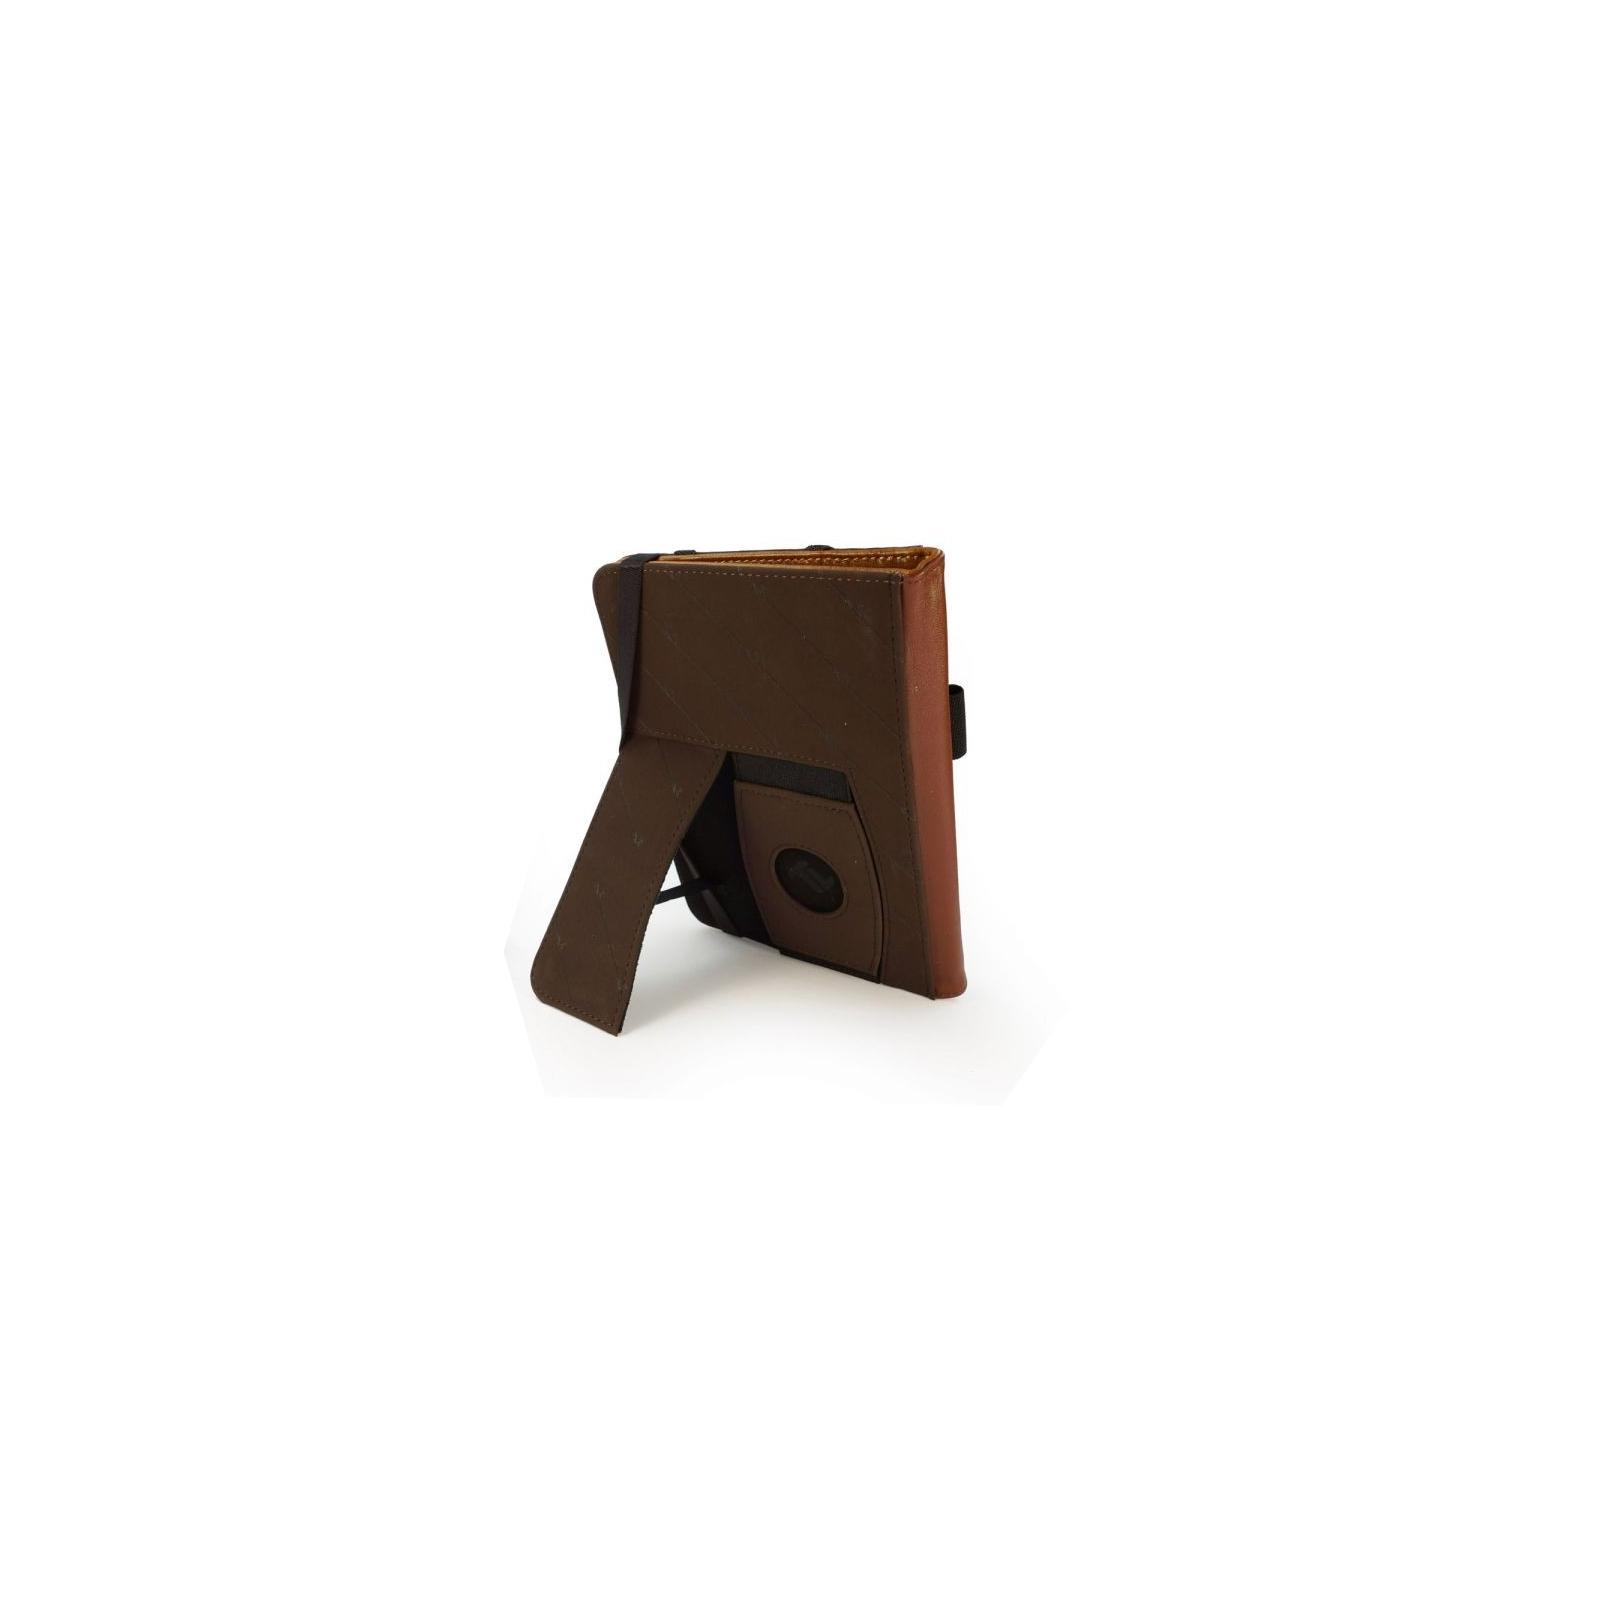 Чехол для электронной книги Tuff-Luv 6 Embrace Plus Leather Vintage Brown (A10_41) изображение 2